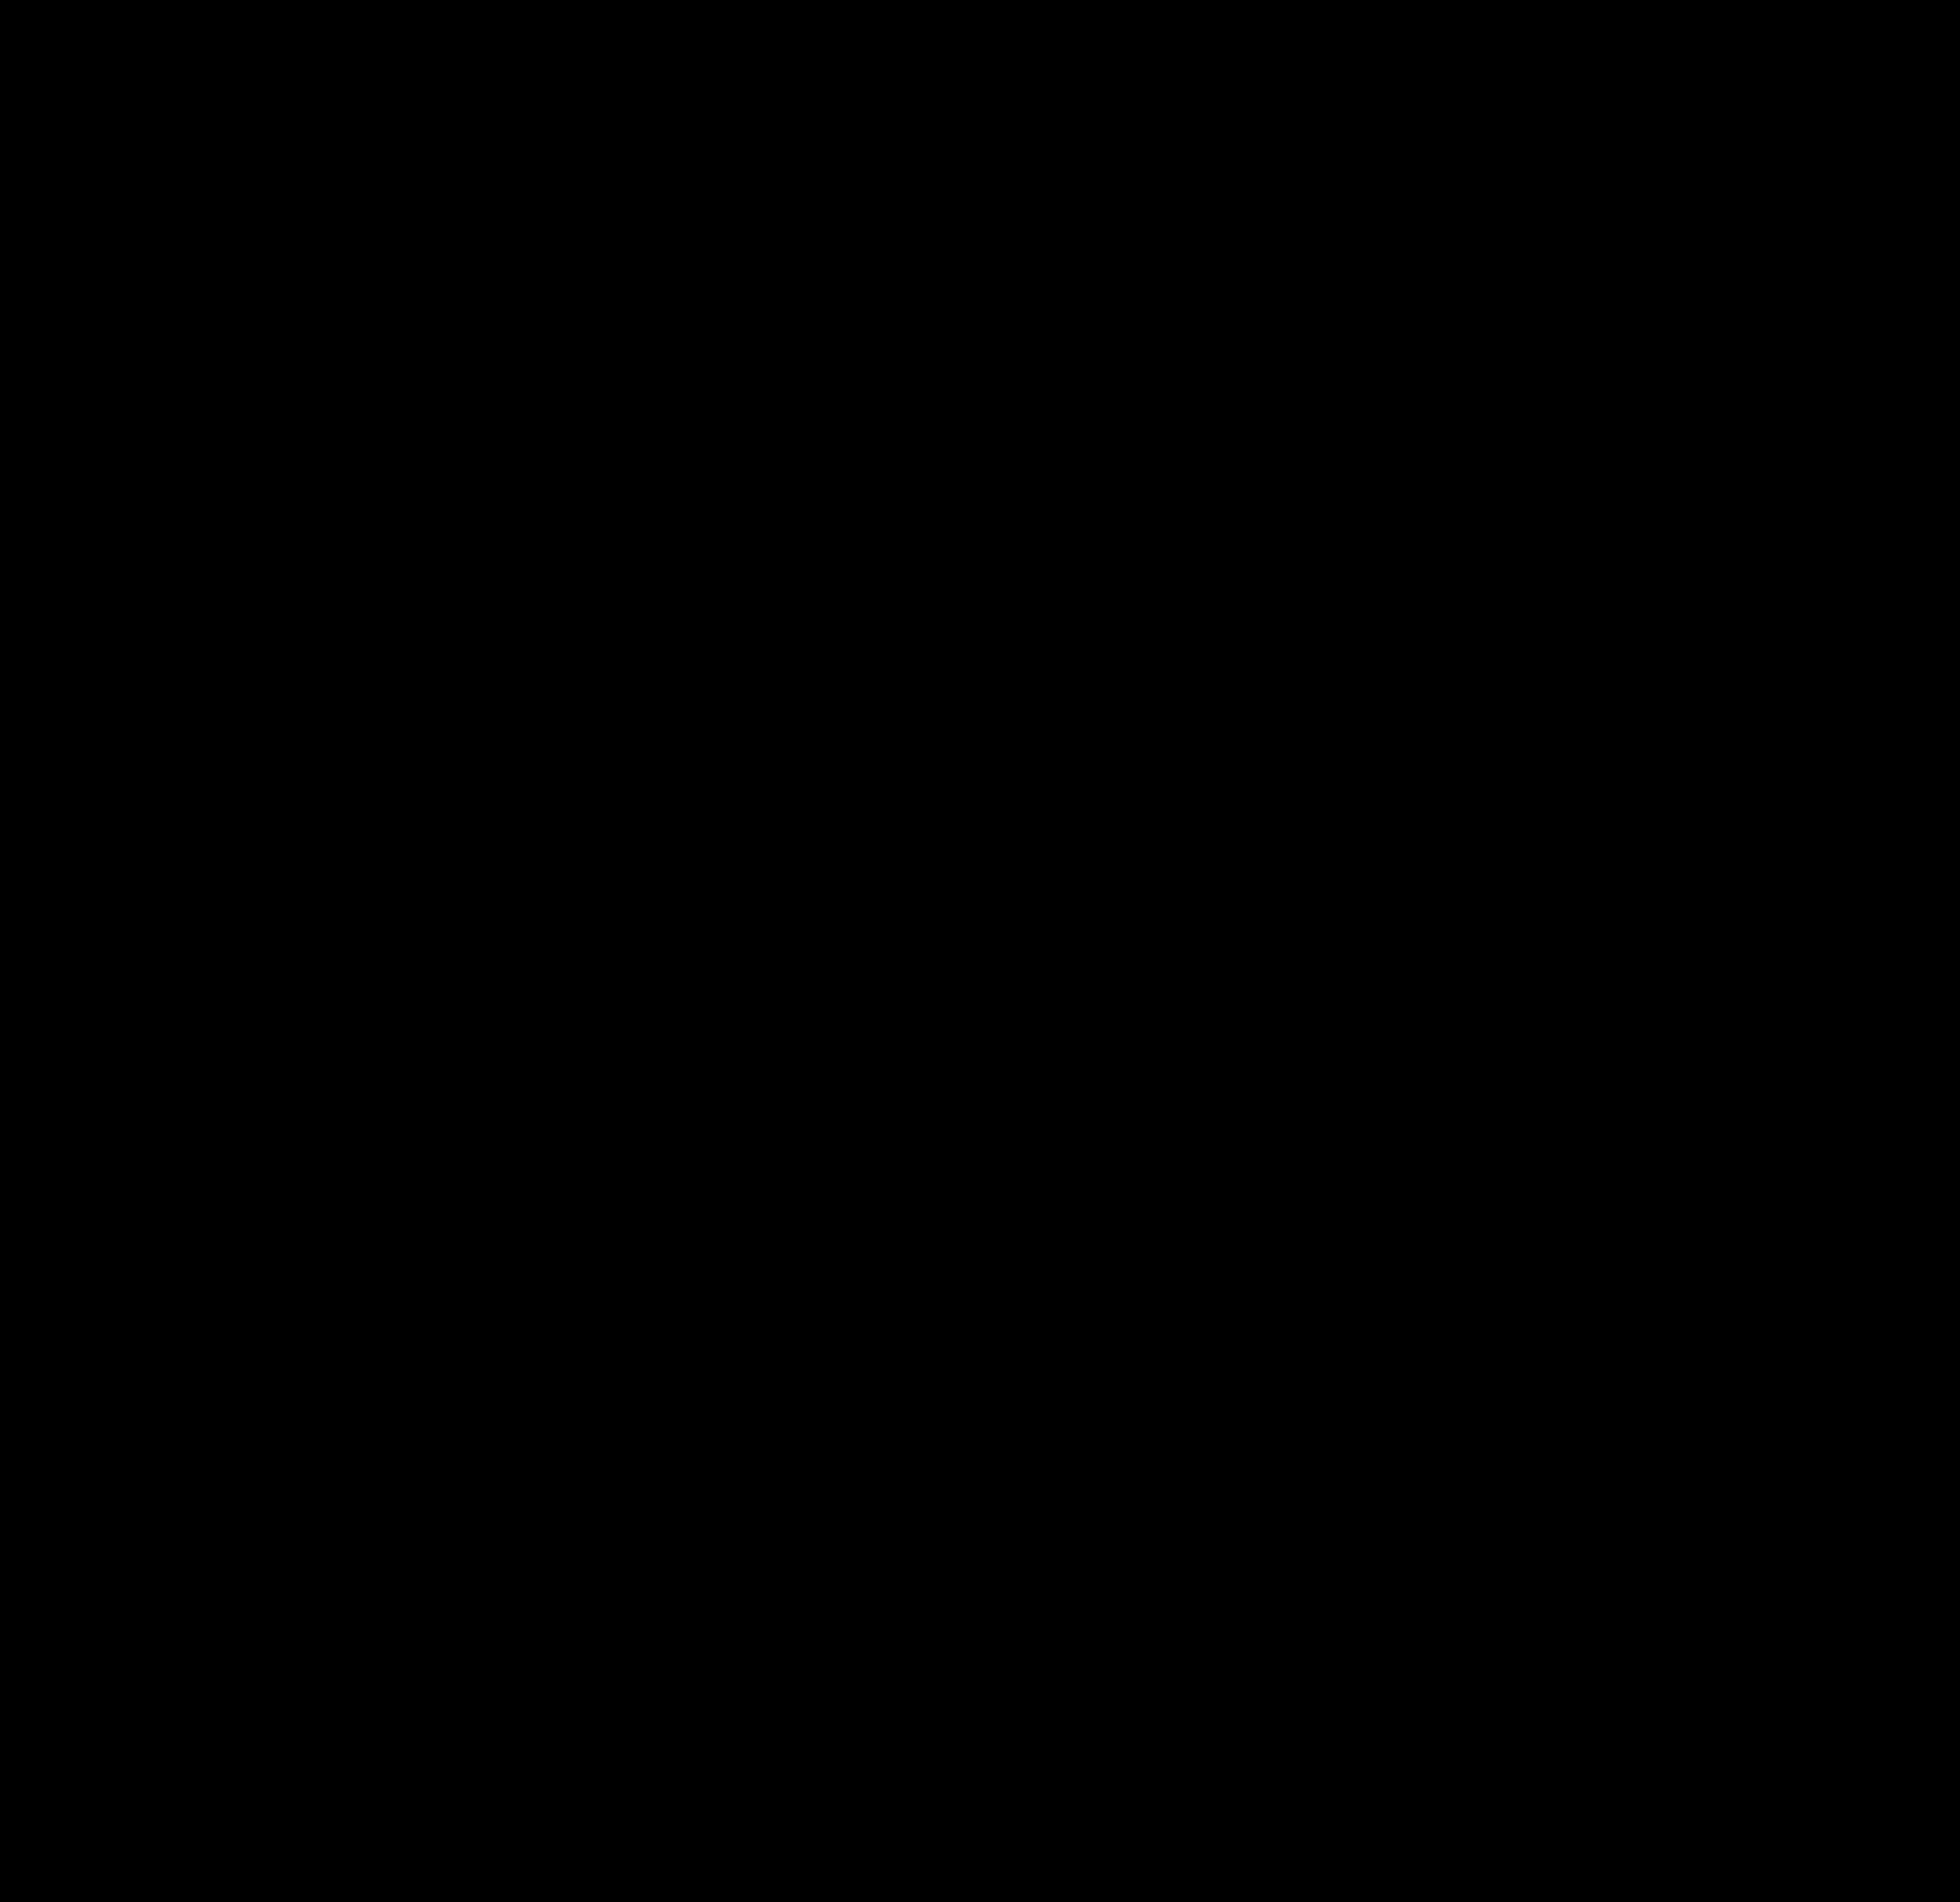 Caffeine Structural Formula